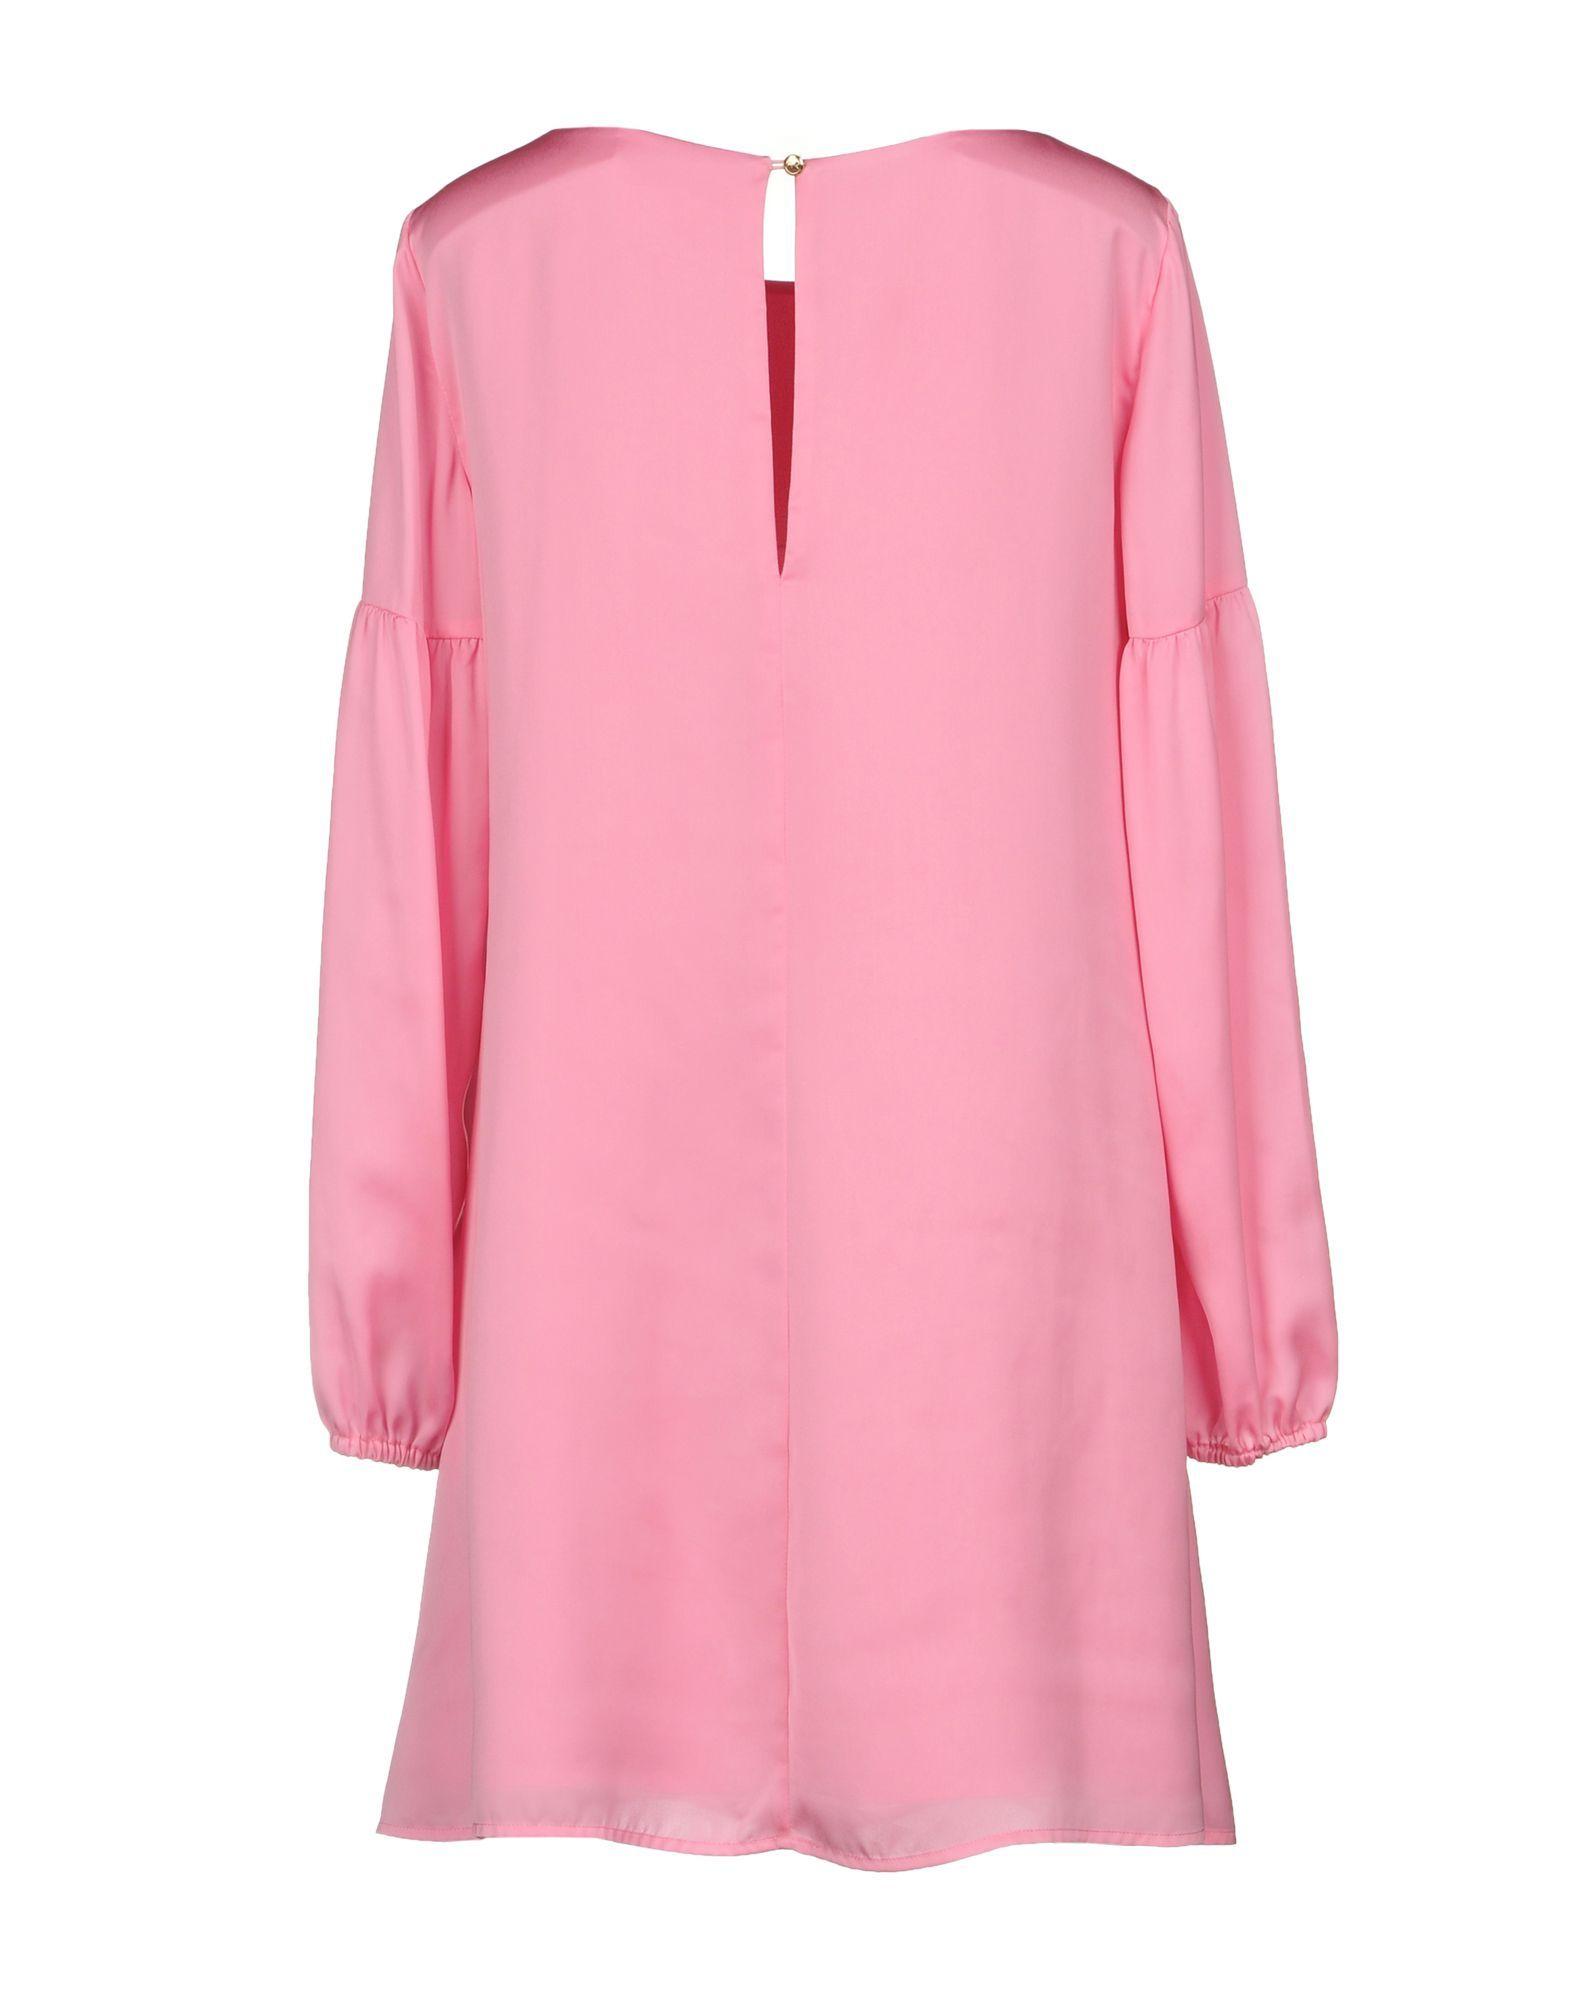 Patrizia Pepe Pink Long Sleeve Dress